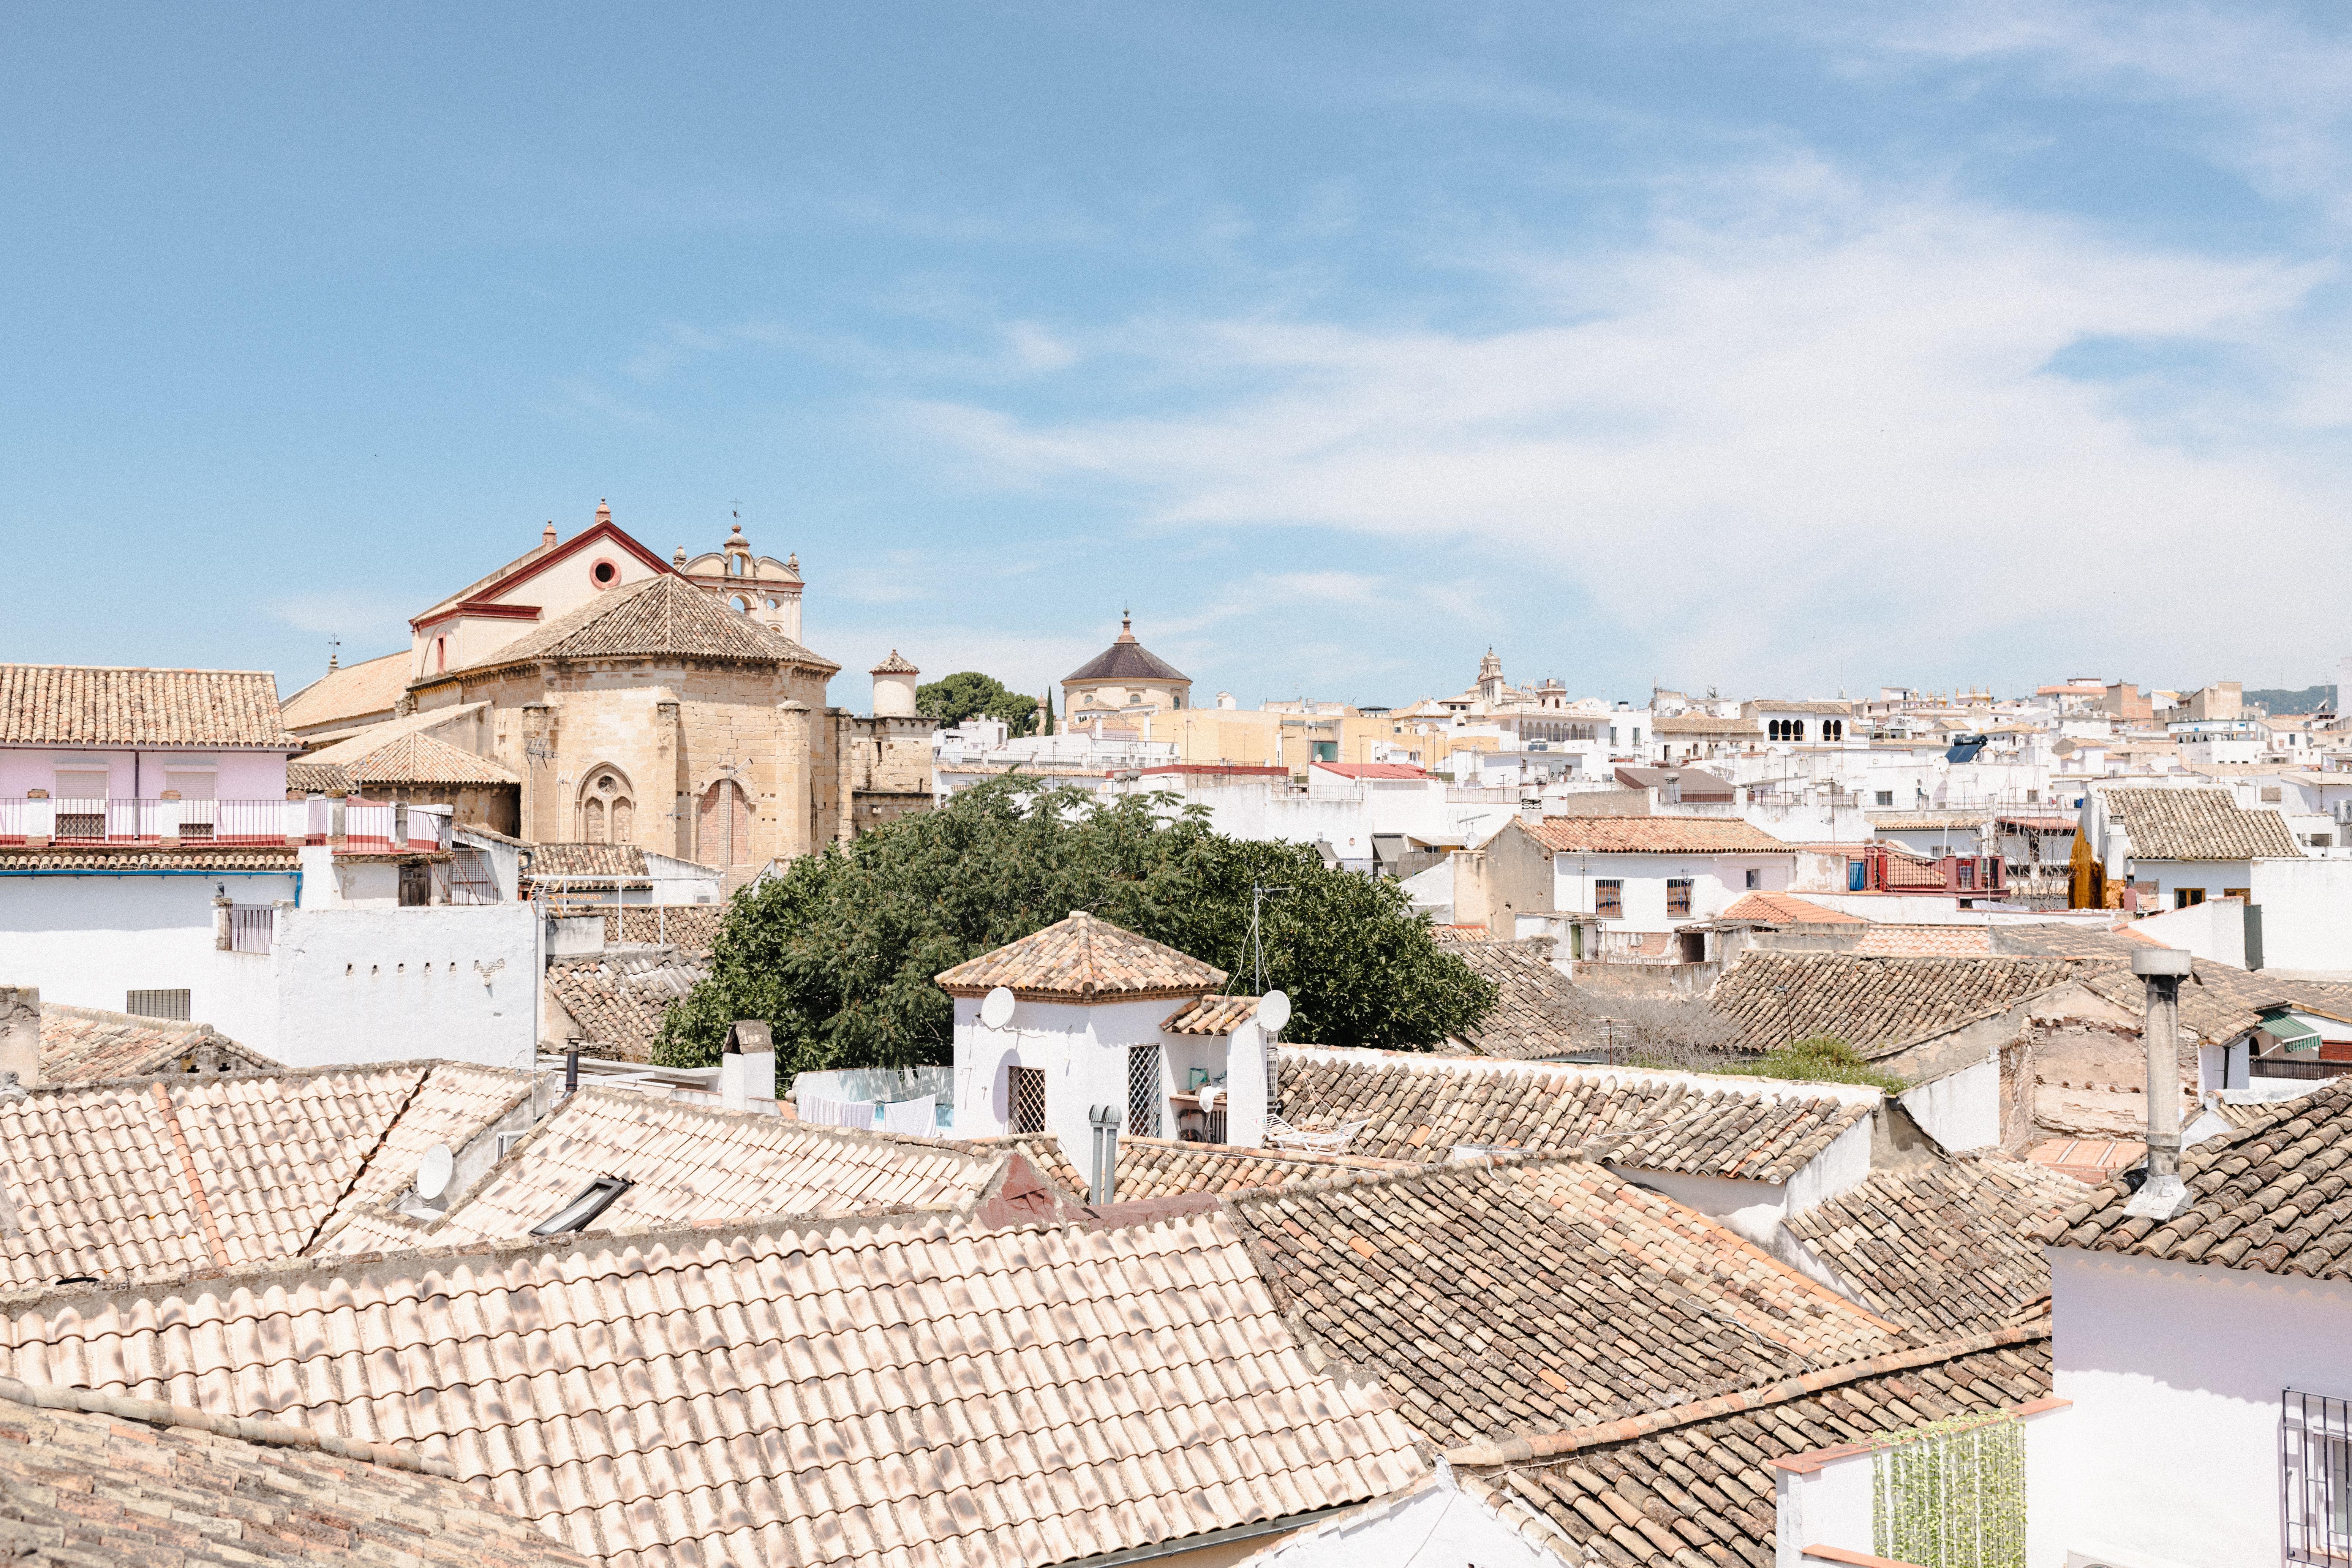 12 + 1 imprescindibles en Córdoba